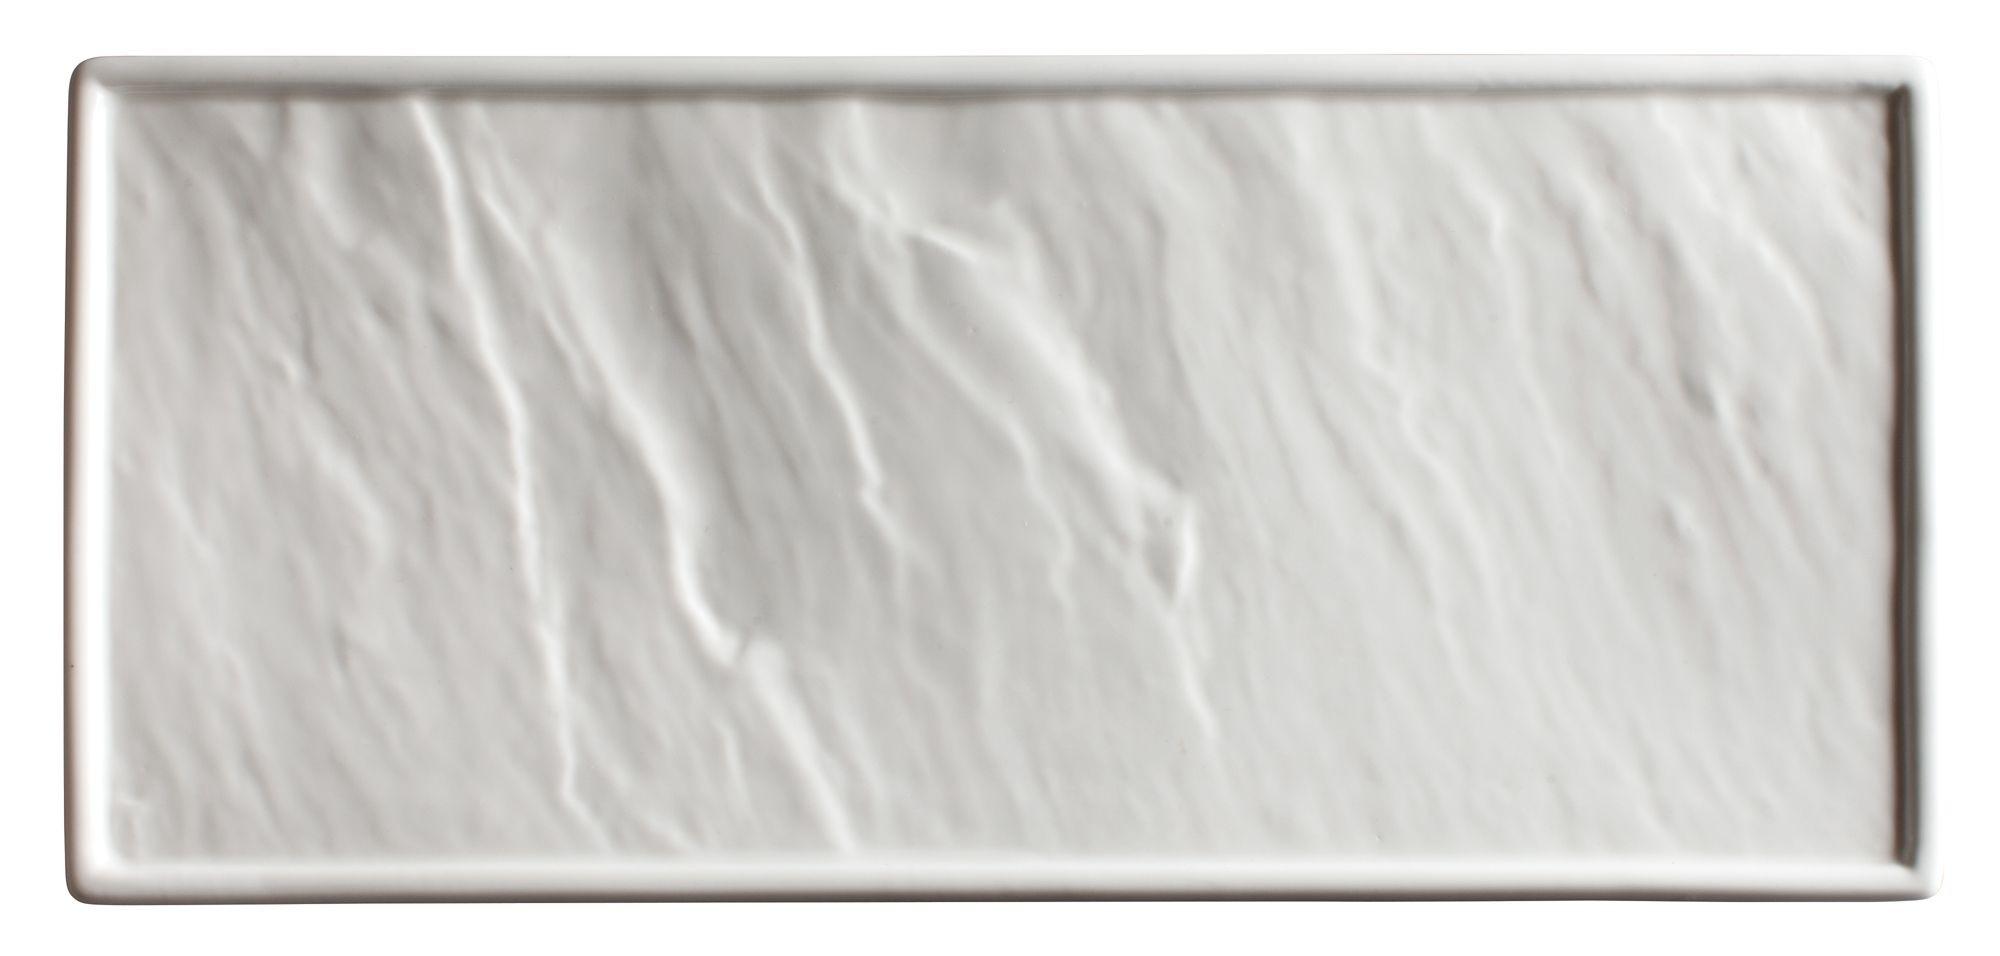 "Winco WDP001-202 Calacatta Creamy White Porcelain Rectangular Platter 12"" x 5-1/2"""